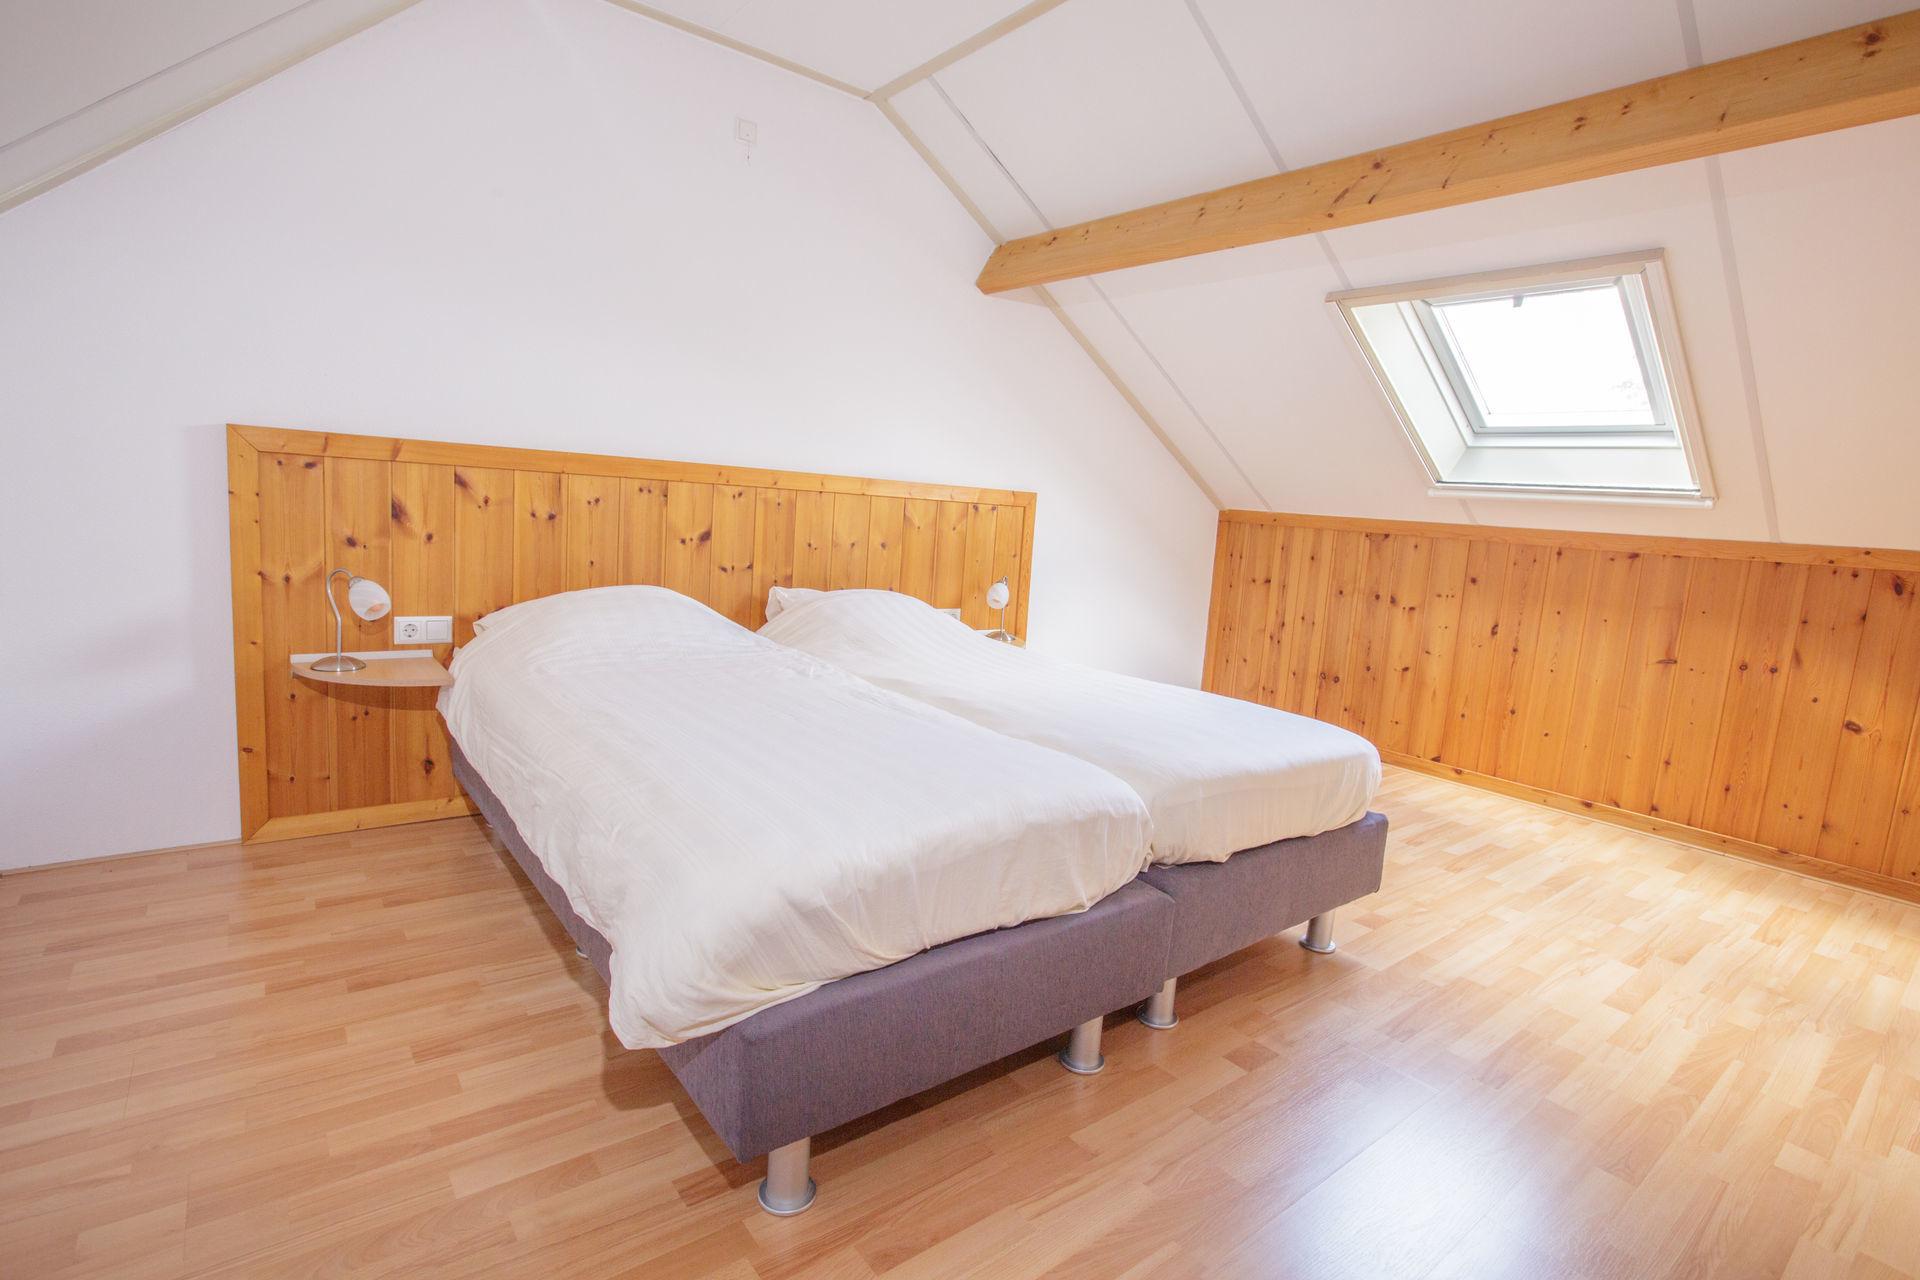 Jacuzzihuisje in de Achterhoek - Korenbloem (slaapkamer)